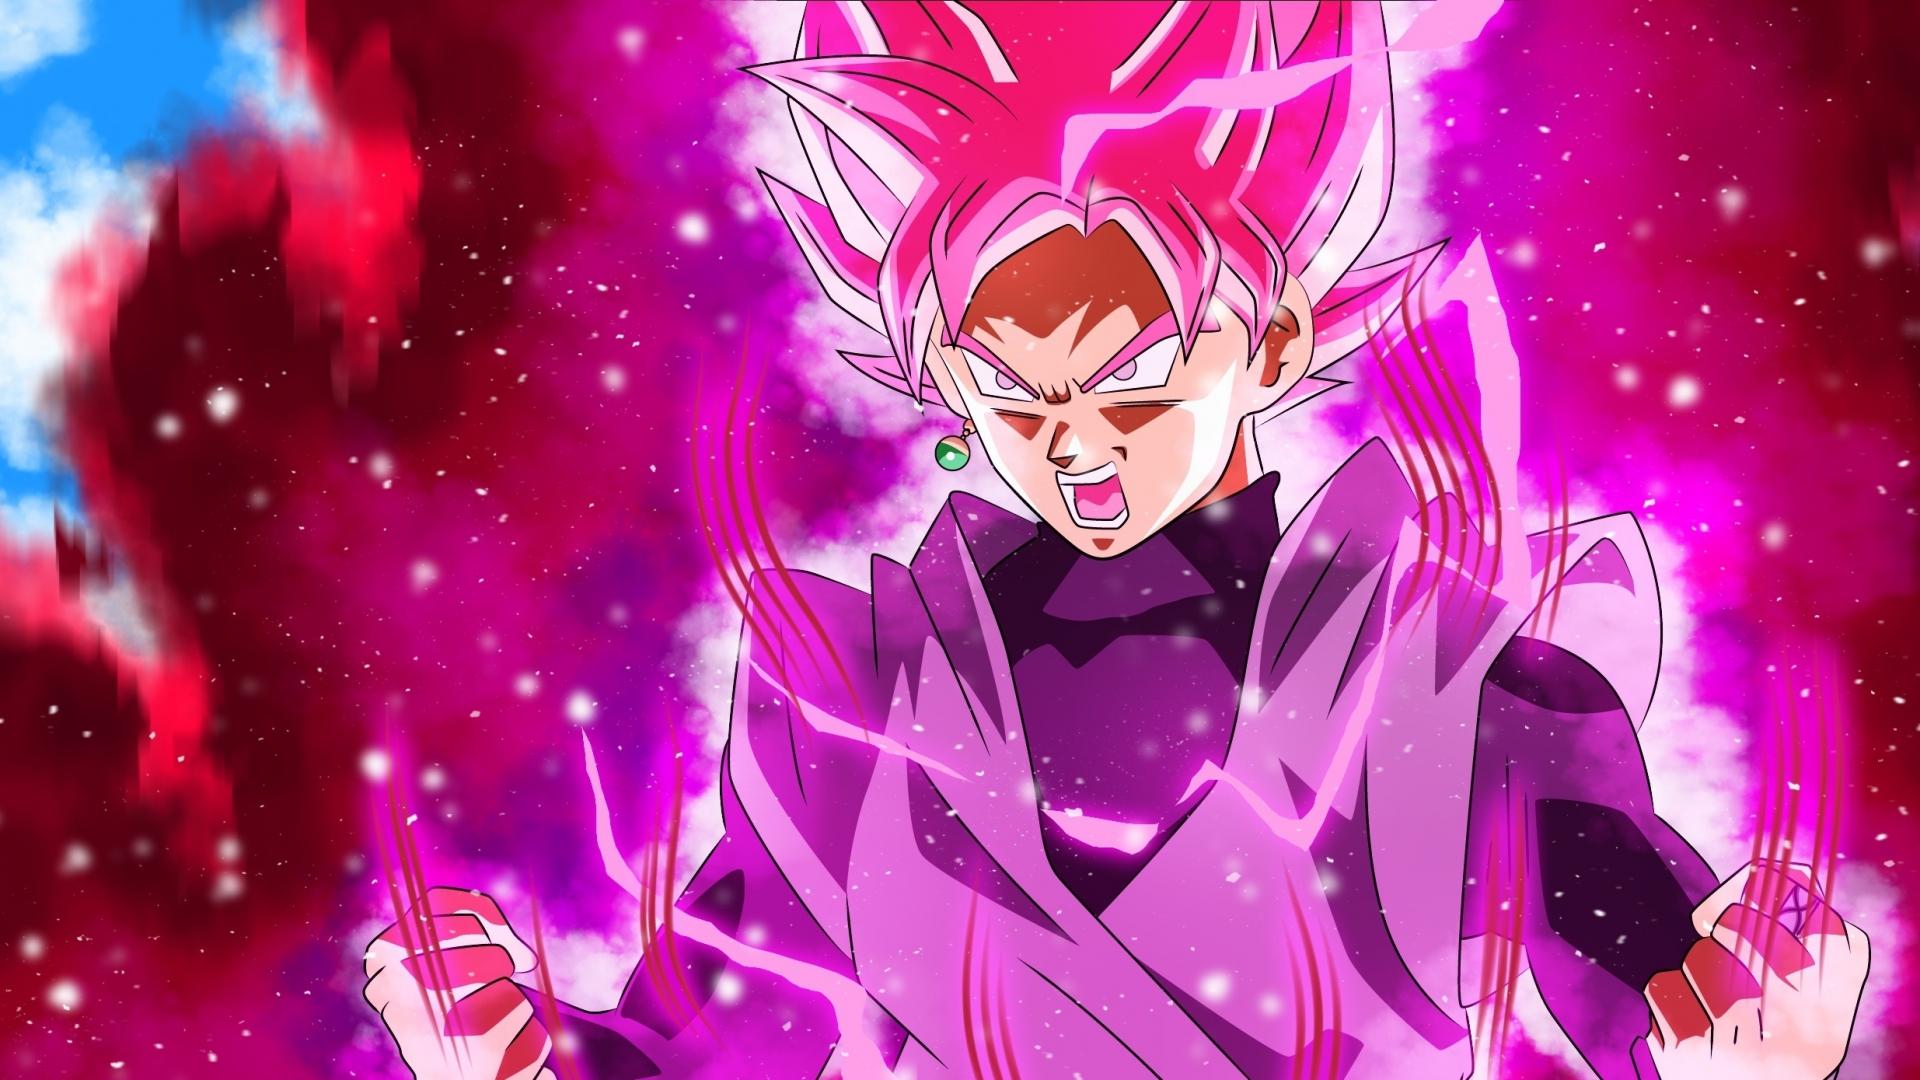 Full Power Dragon Ball Super Black Goku 1920x1080 Wallpaper